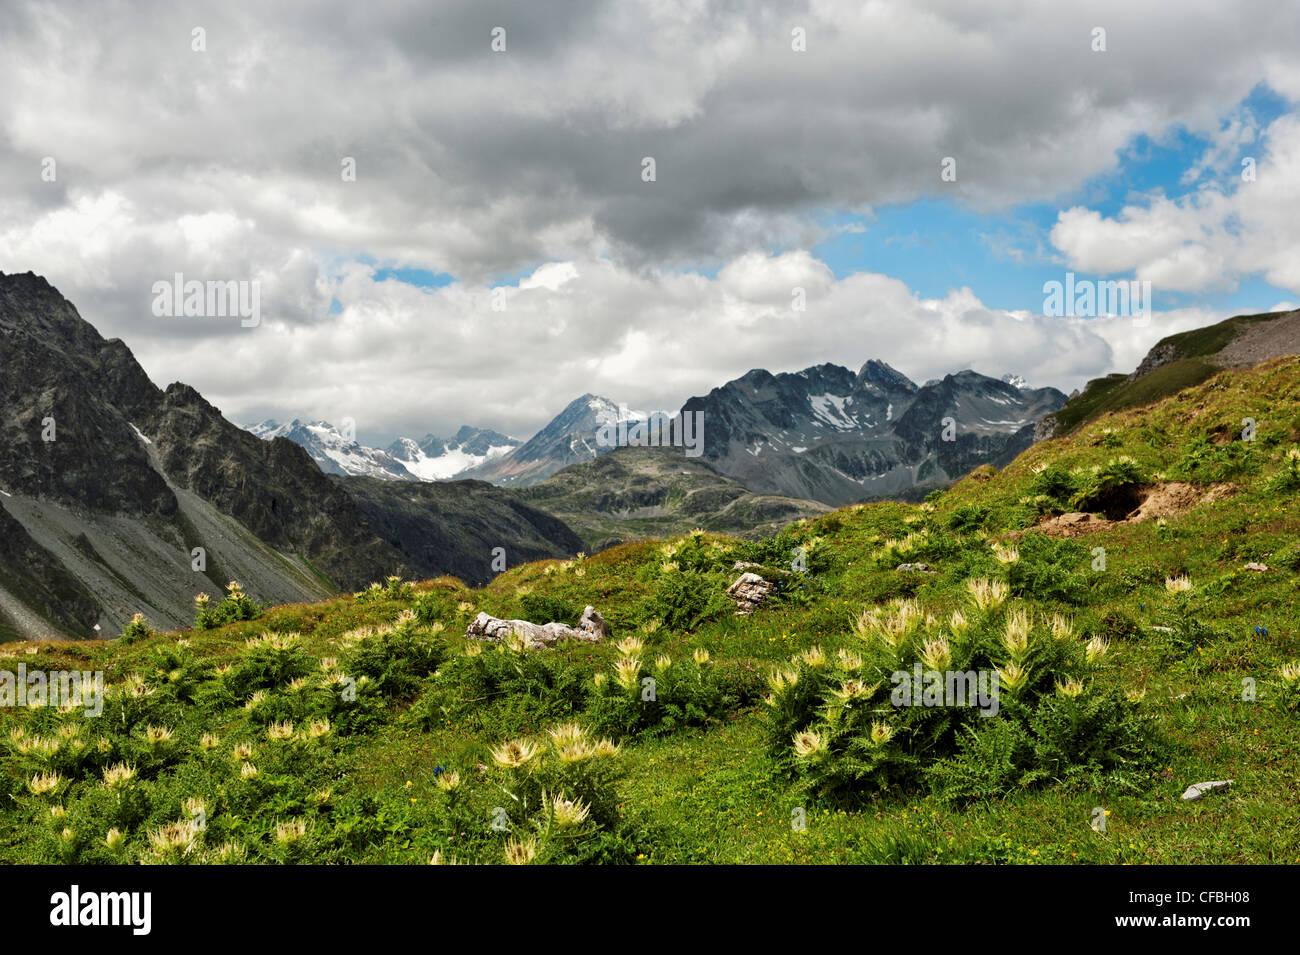 Albula, alp, shieling, pasture, Cirsium spinosissimum, thistle, Plume thistles, Engadine, Upper Engadine, sky, skye Stock Photo